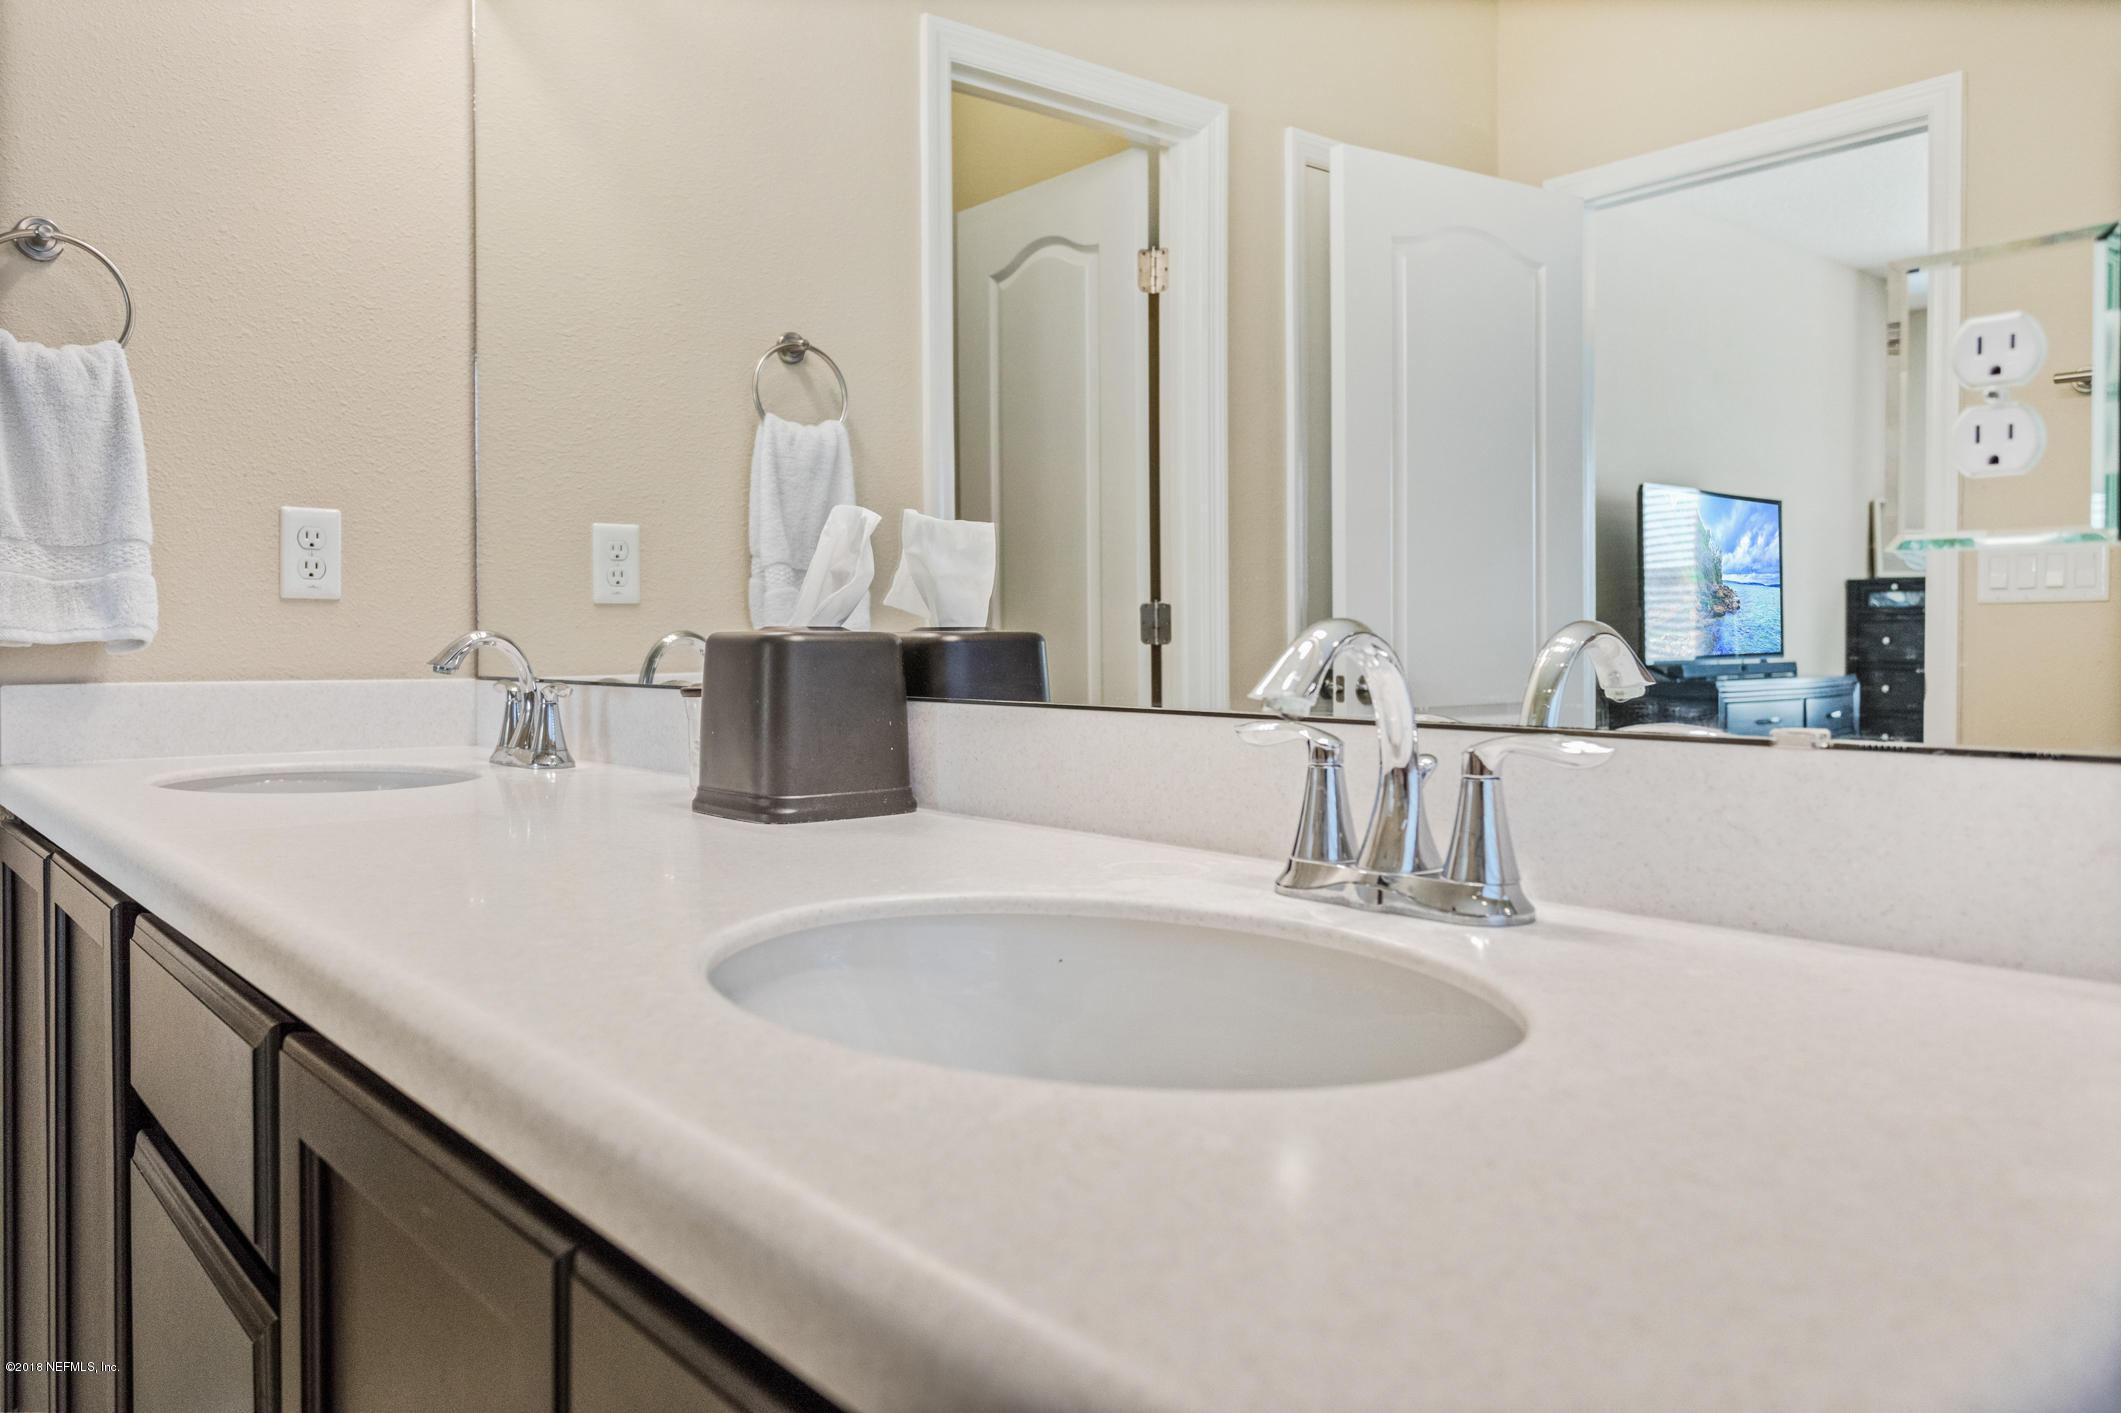 408 WAYFARE, JACKSONVILLE, FLORIDA 32081, 3 Bedrooms Bedrooms, ,2 BathroomsBathrooms,Residential - single family,For sale,WAYFARE,971329